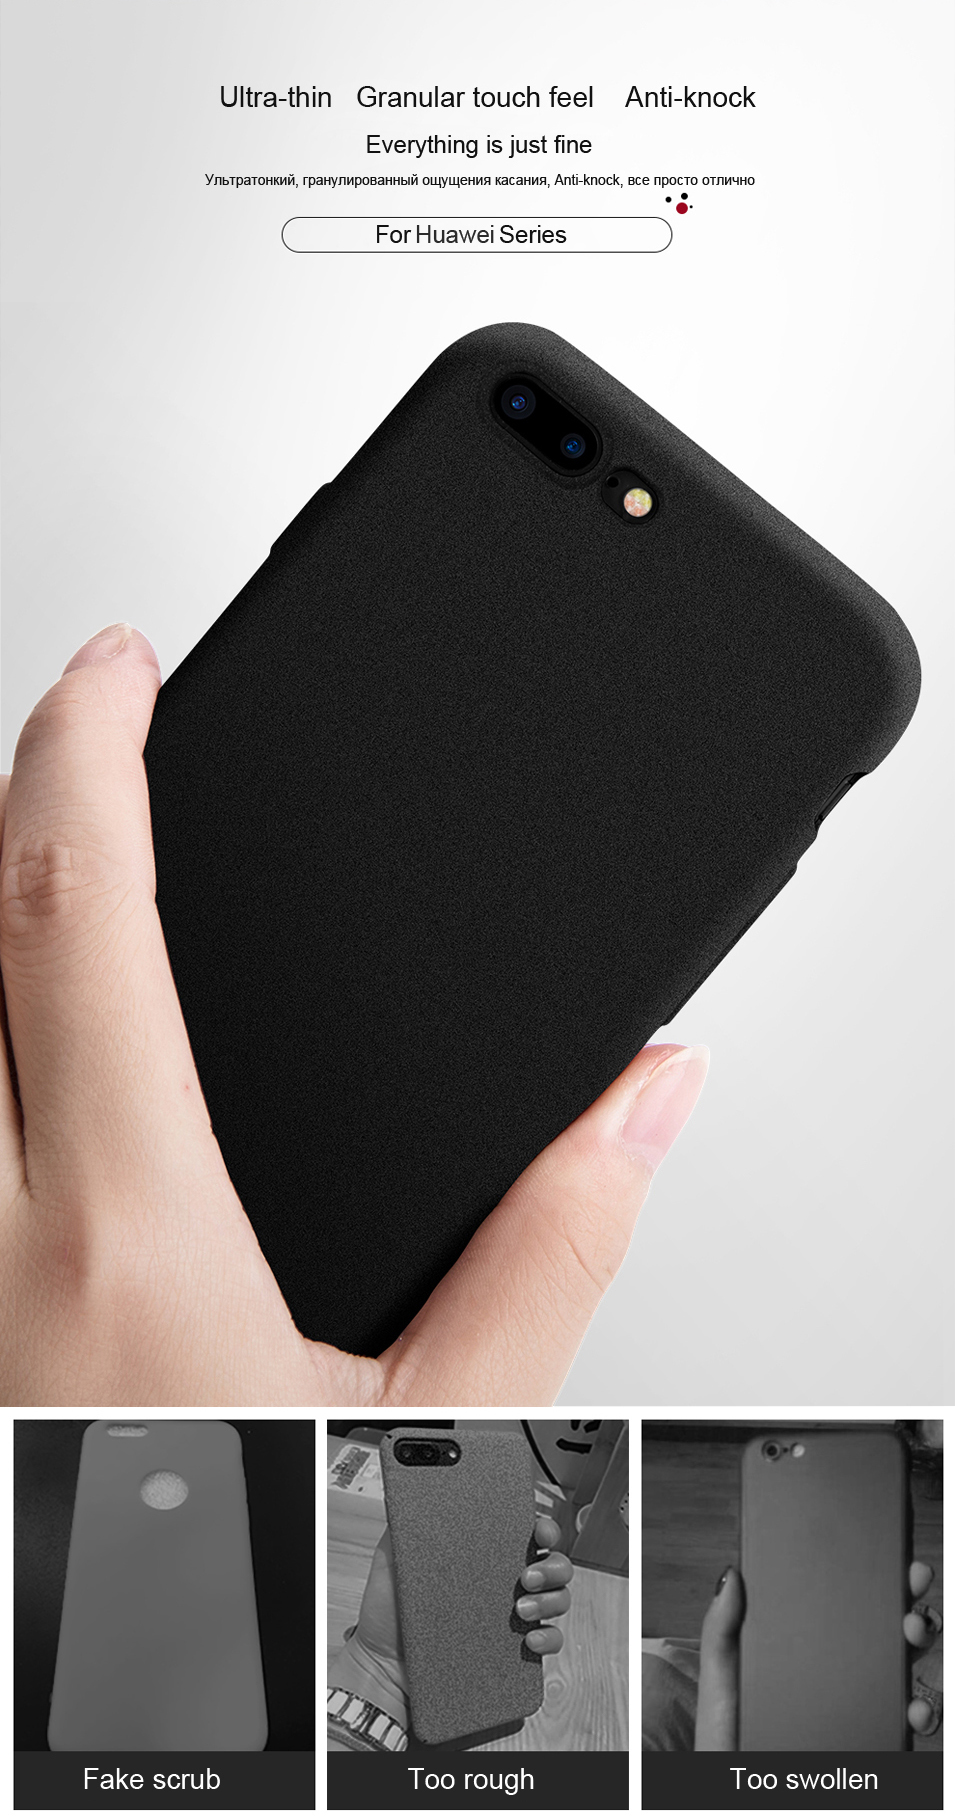 Silicone Soft TPU Matte Case for Huawei P20 P10 Lite P20 Pro P10 P9 P8 Lite 2017 P Smart Nova 2 Plus 2i 2s Case Cover Phone Bag (9)